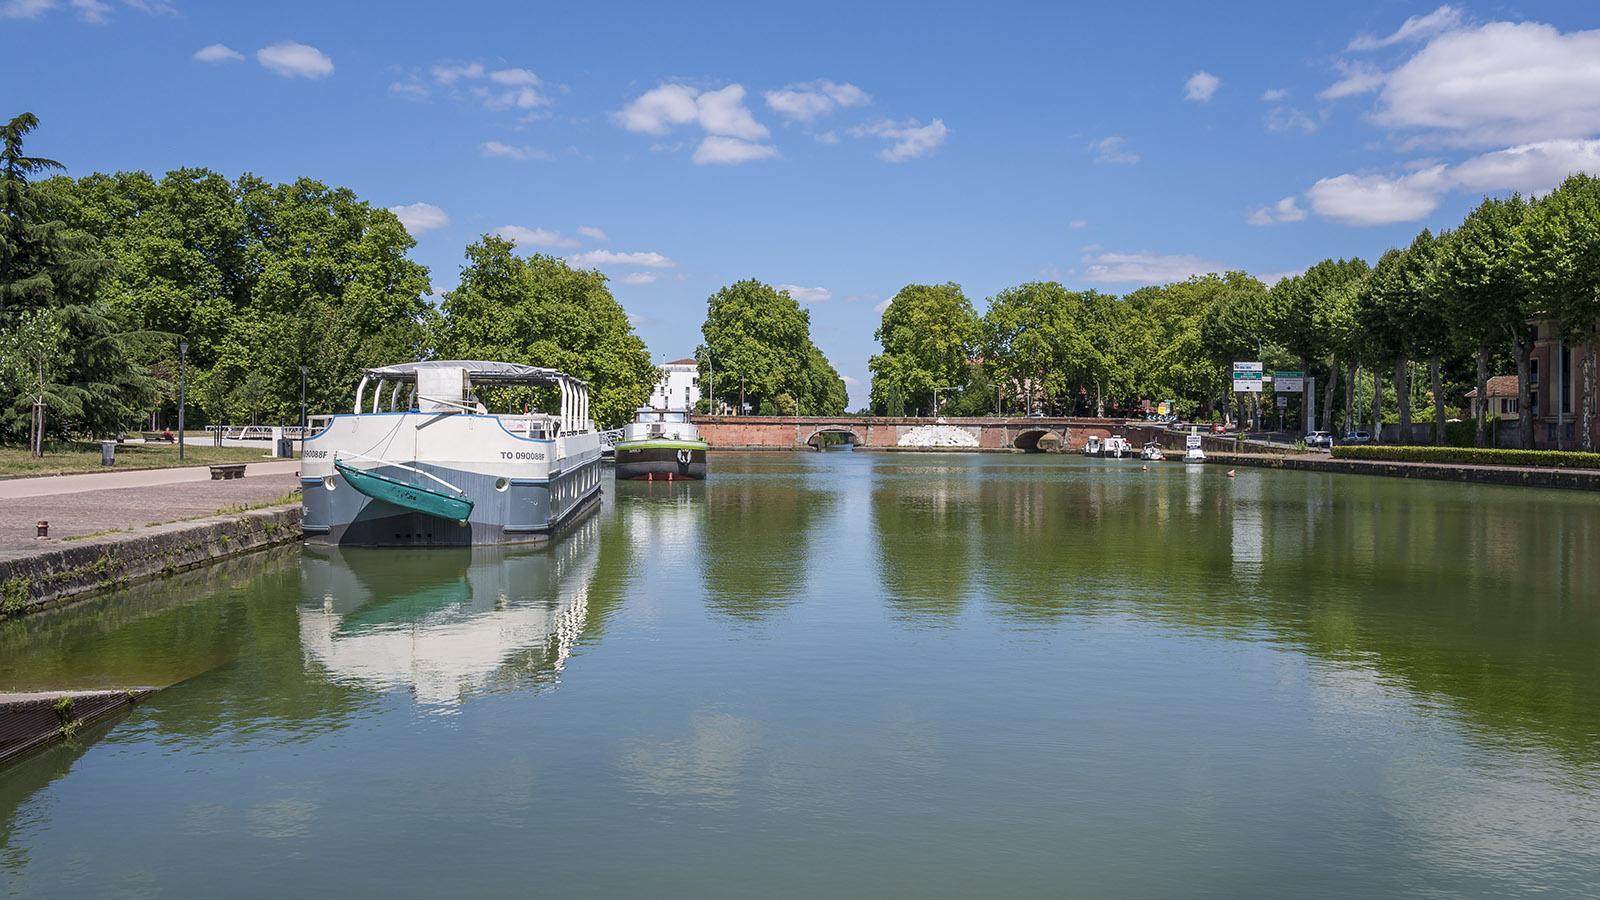 Der Port de l'Emboucure mit seinen Ponts-Jumeaux, Zwillingsbrücken. Foto: Hilke Maunder